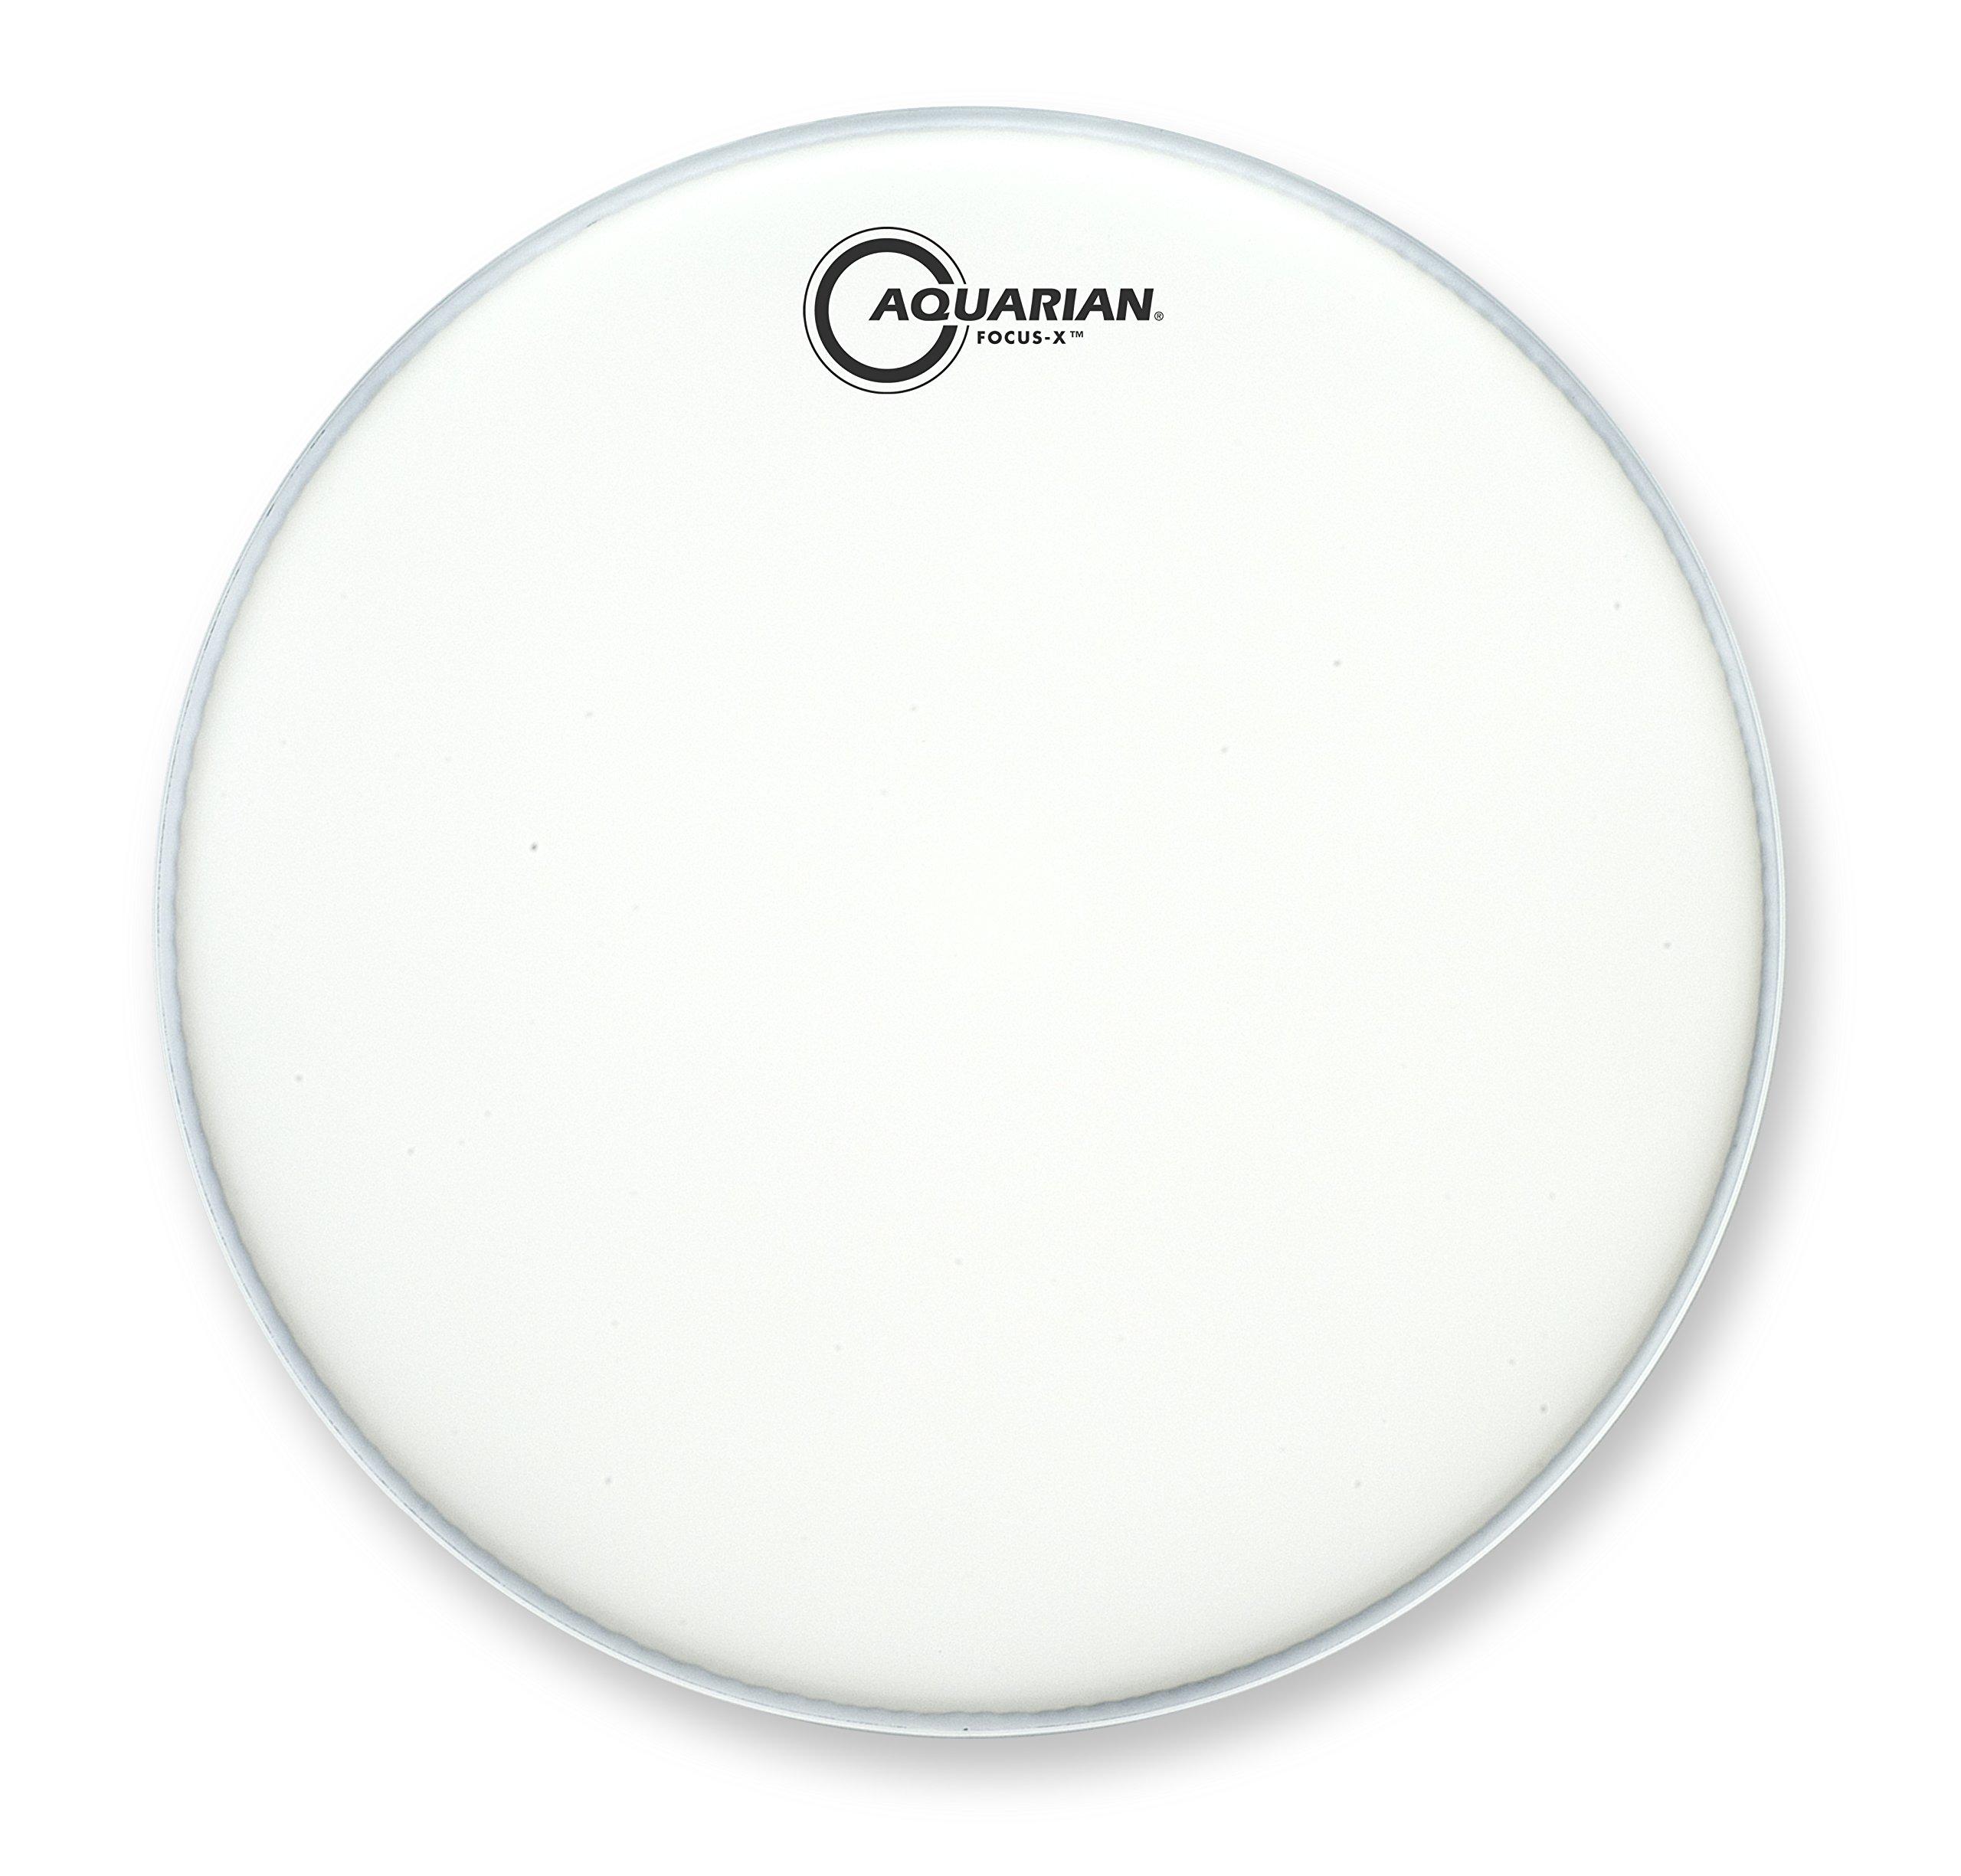 Aquarian Drumheads TCFX12 Coated Focus-X 12-inch Tom Tom/Snare Drum Head